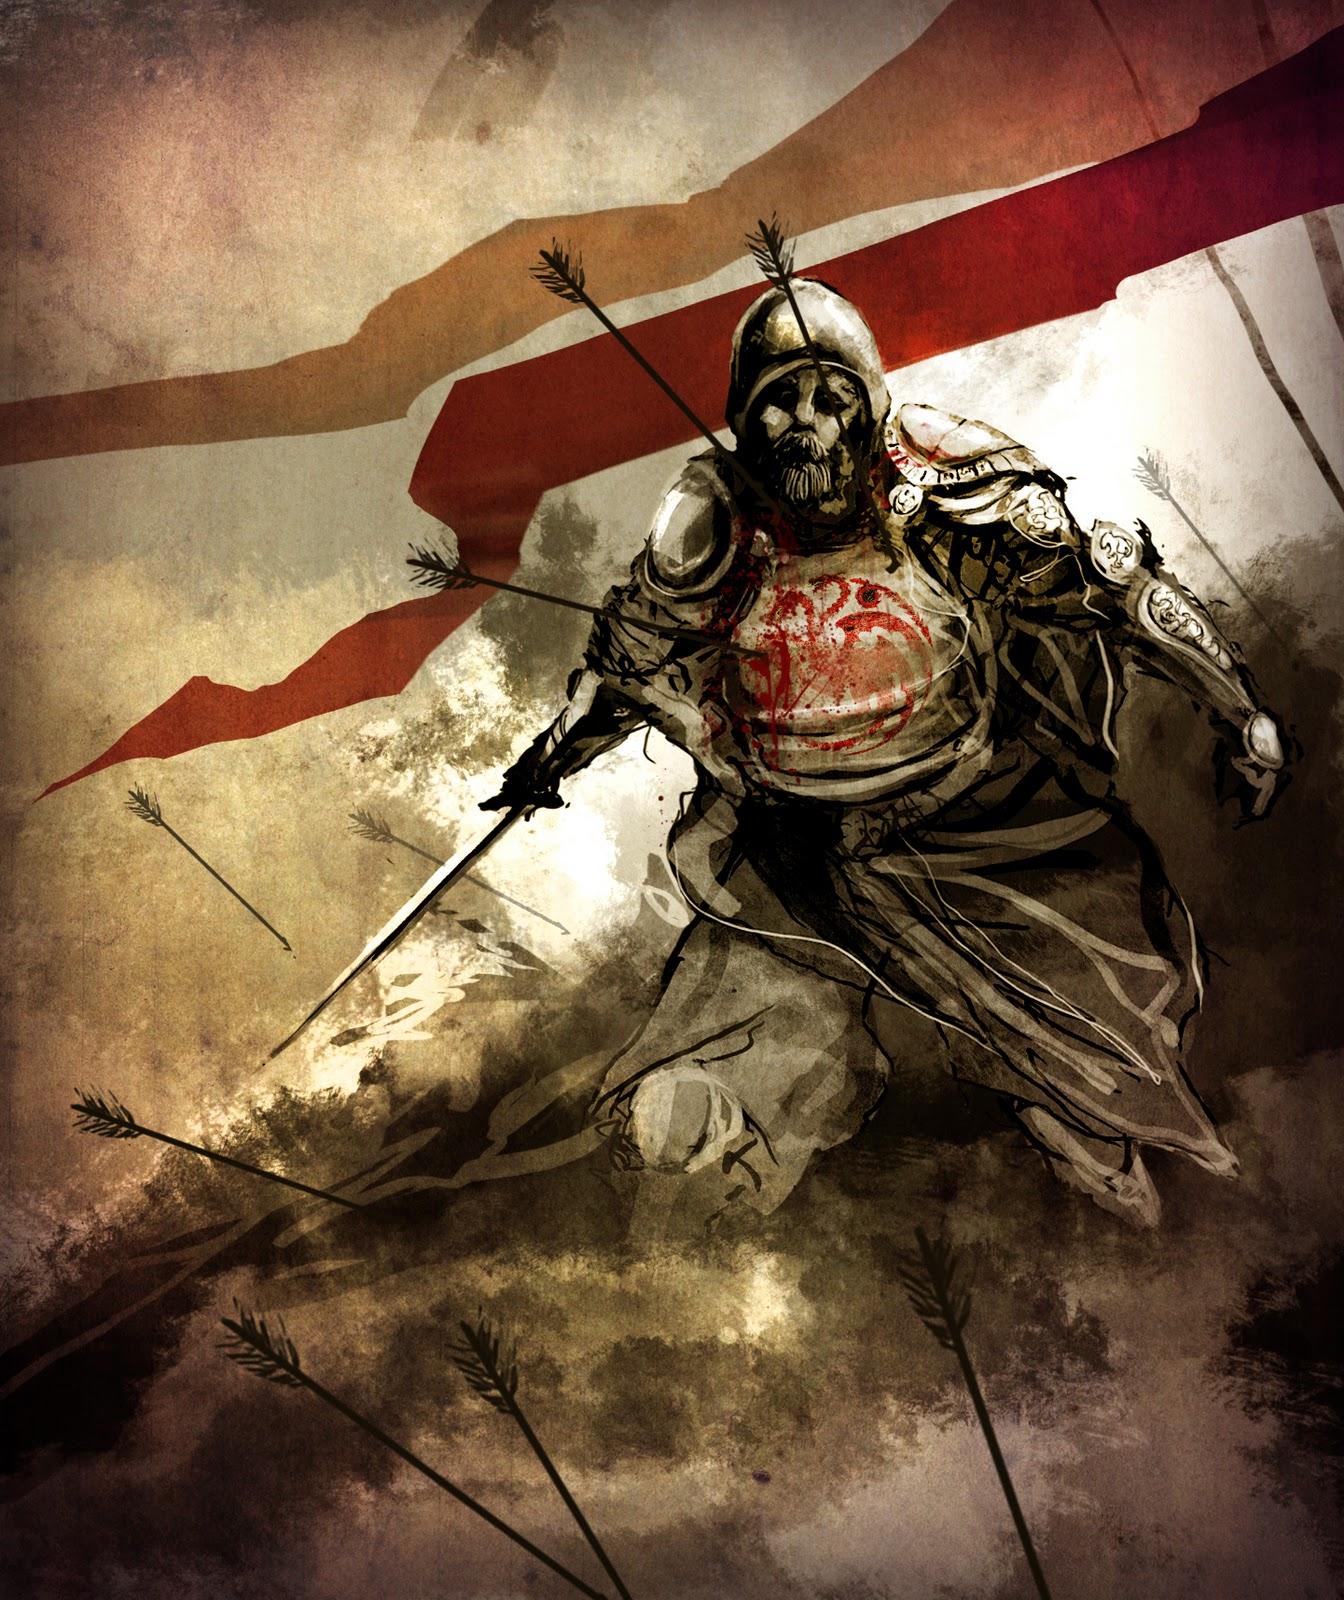 http://4.bp.blogspot.com/-_evCNYJrn2s/Tx83vtFmidI/AAAAAAAAAEQ/sMuXn6XnyH8/s1600/dornish+rebellion.jpg